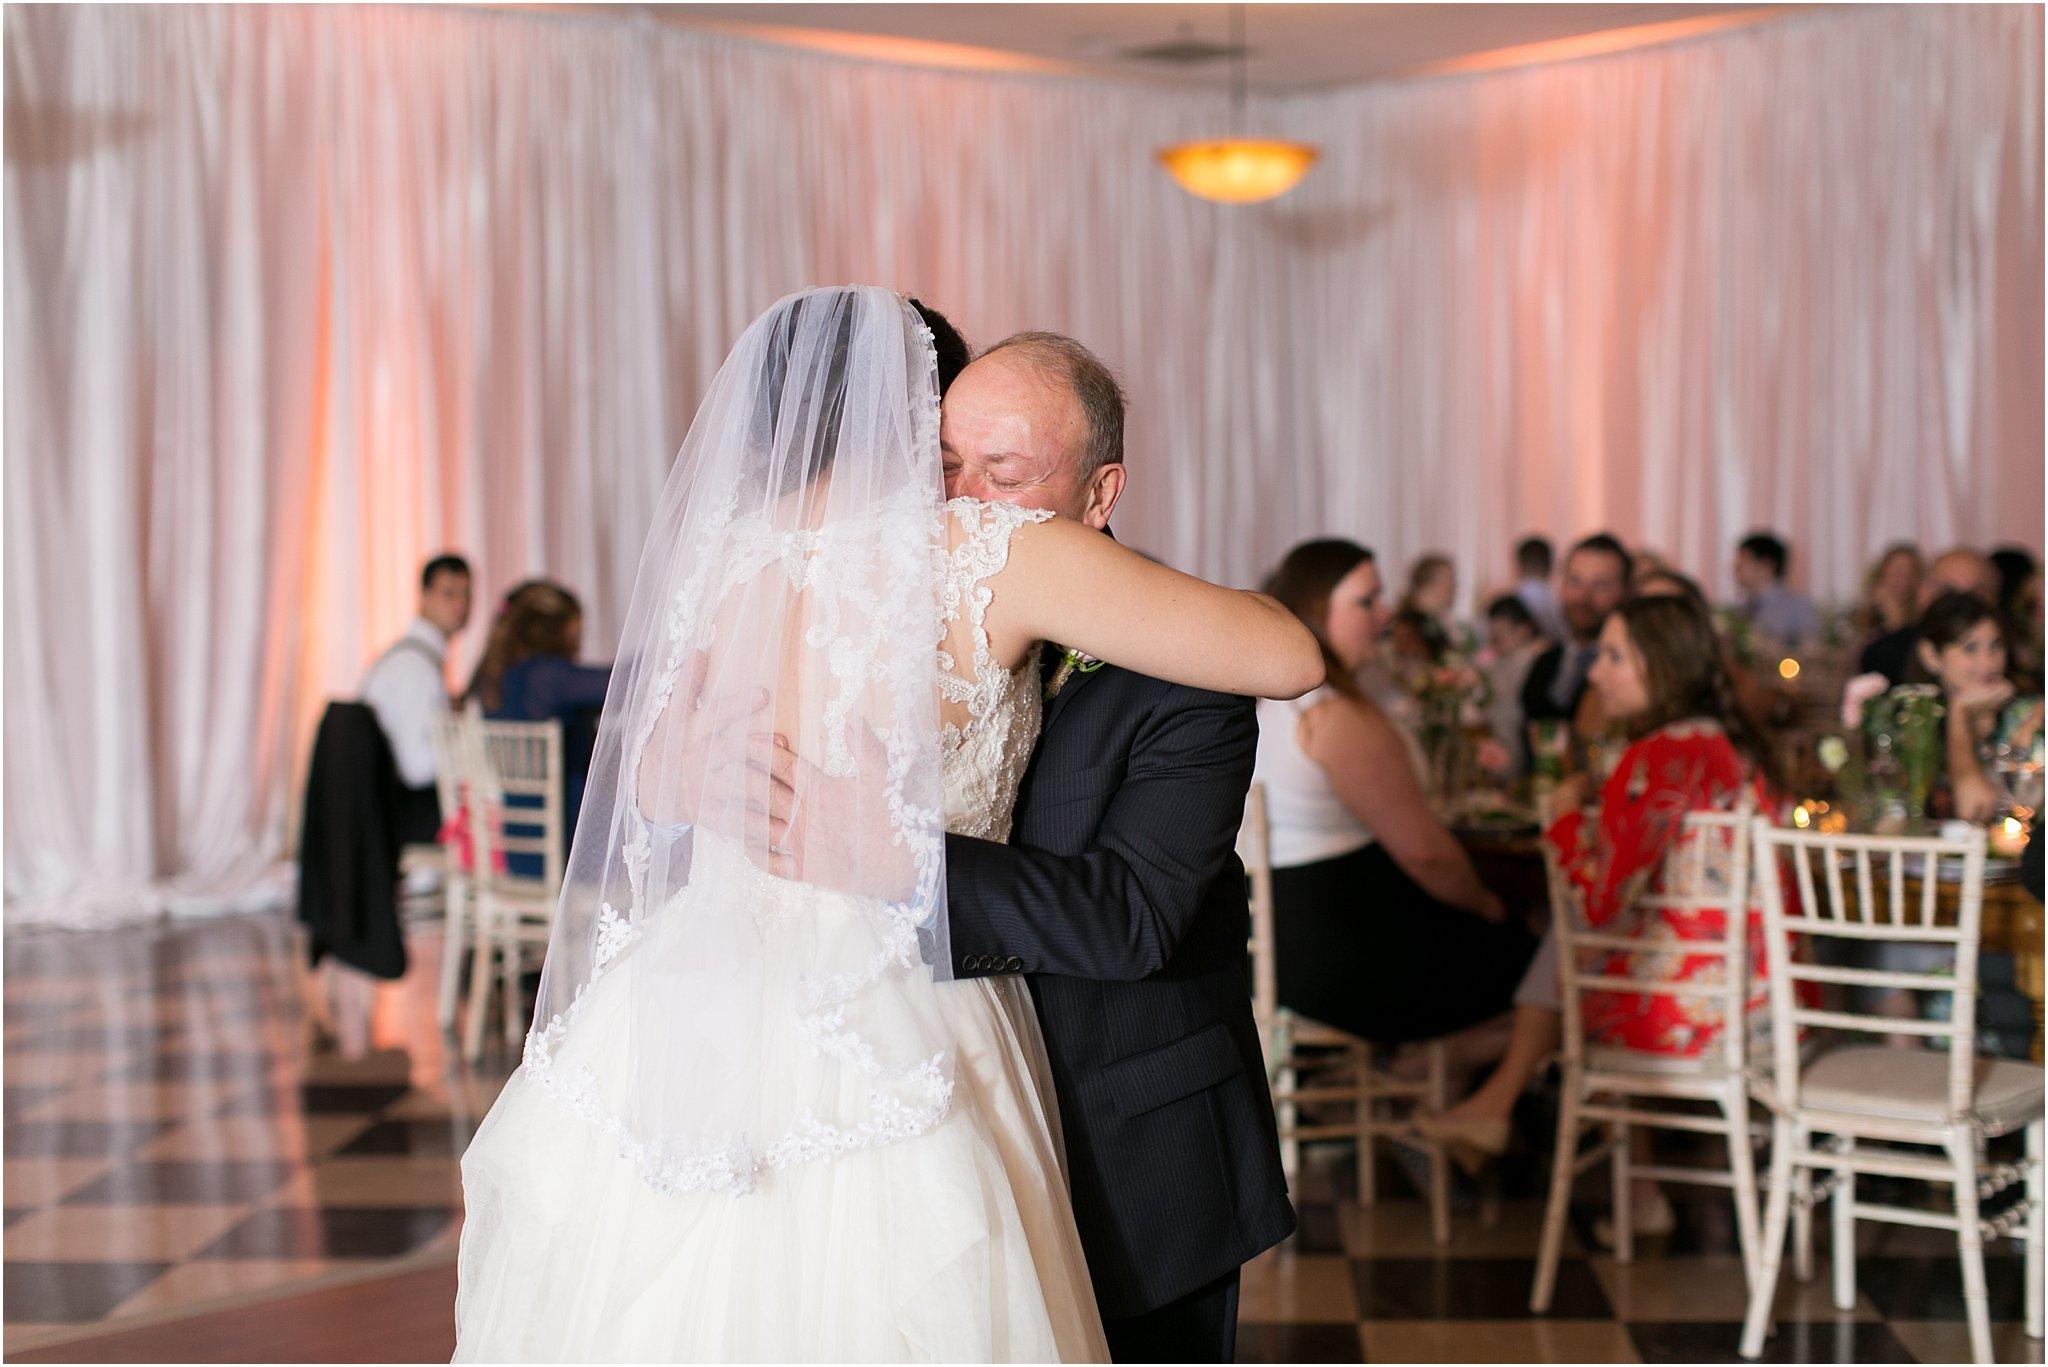 jessica_ryan_photography_virginia_wedding_photographer_wedding_hurricane_norfolk_botanical_gardens_hurricane_matthew_wedding_3633